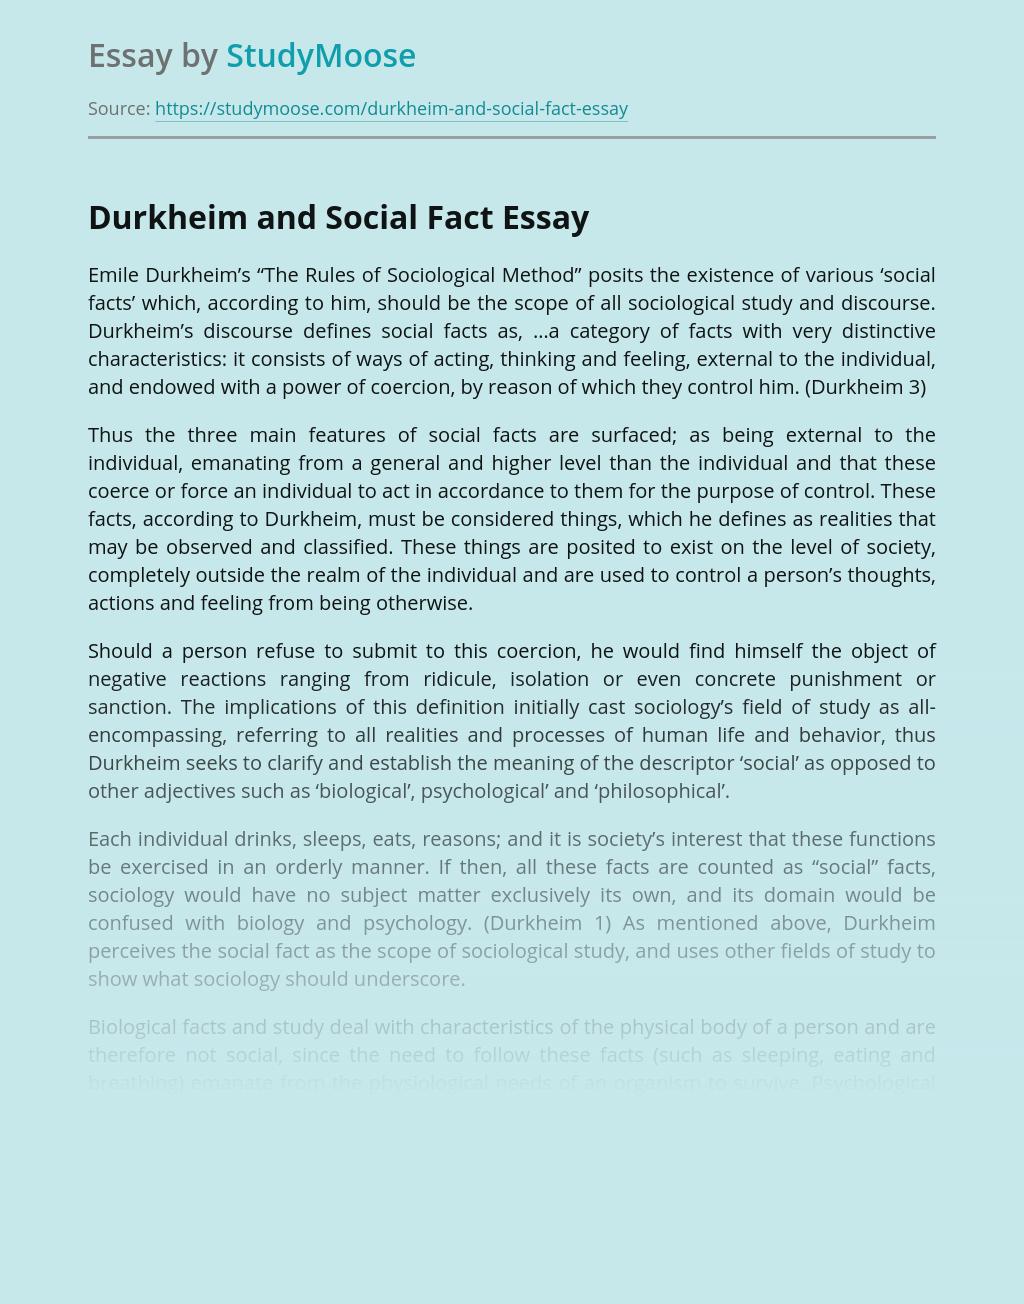 Society in Durkheim's The Rules of Sociological Method